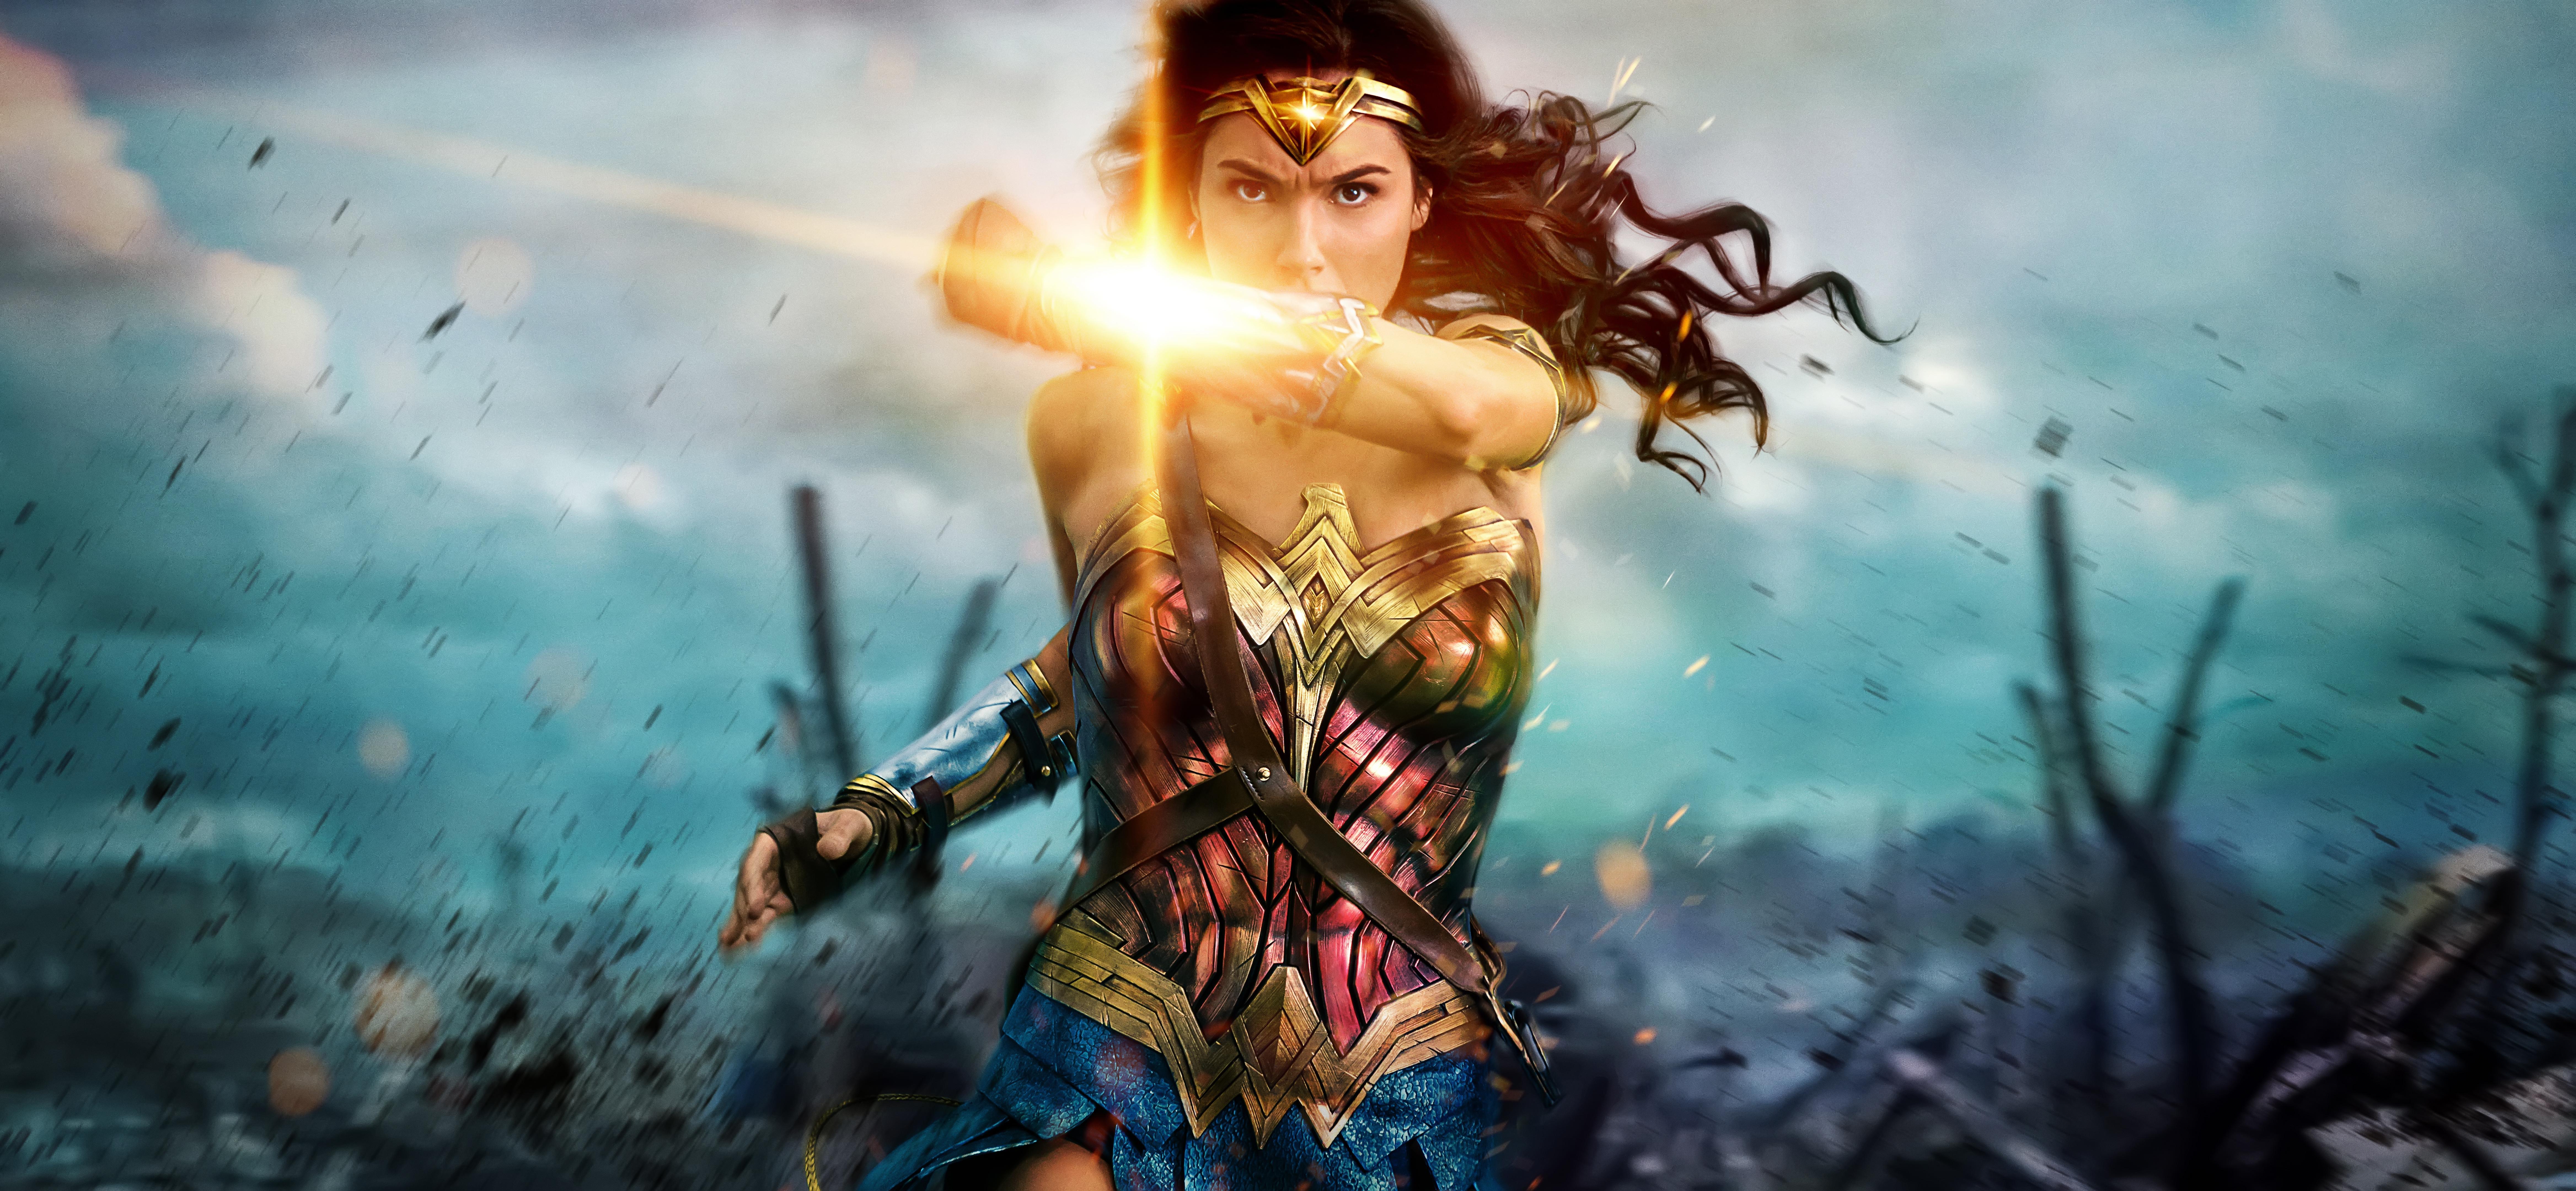 Wonder Woman Logo Wallpapers Top Free Wonder Woman Logo